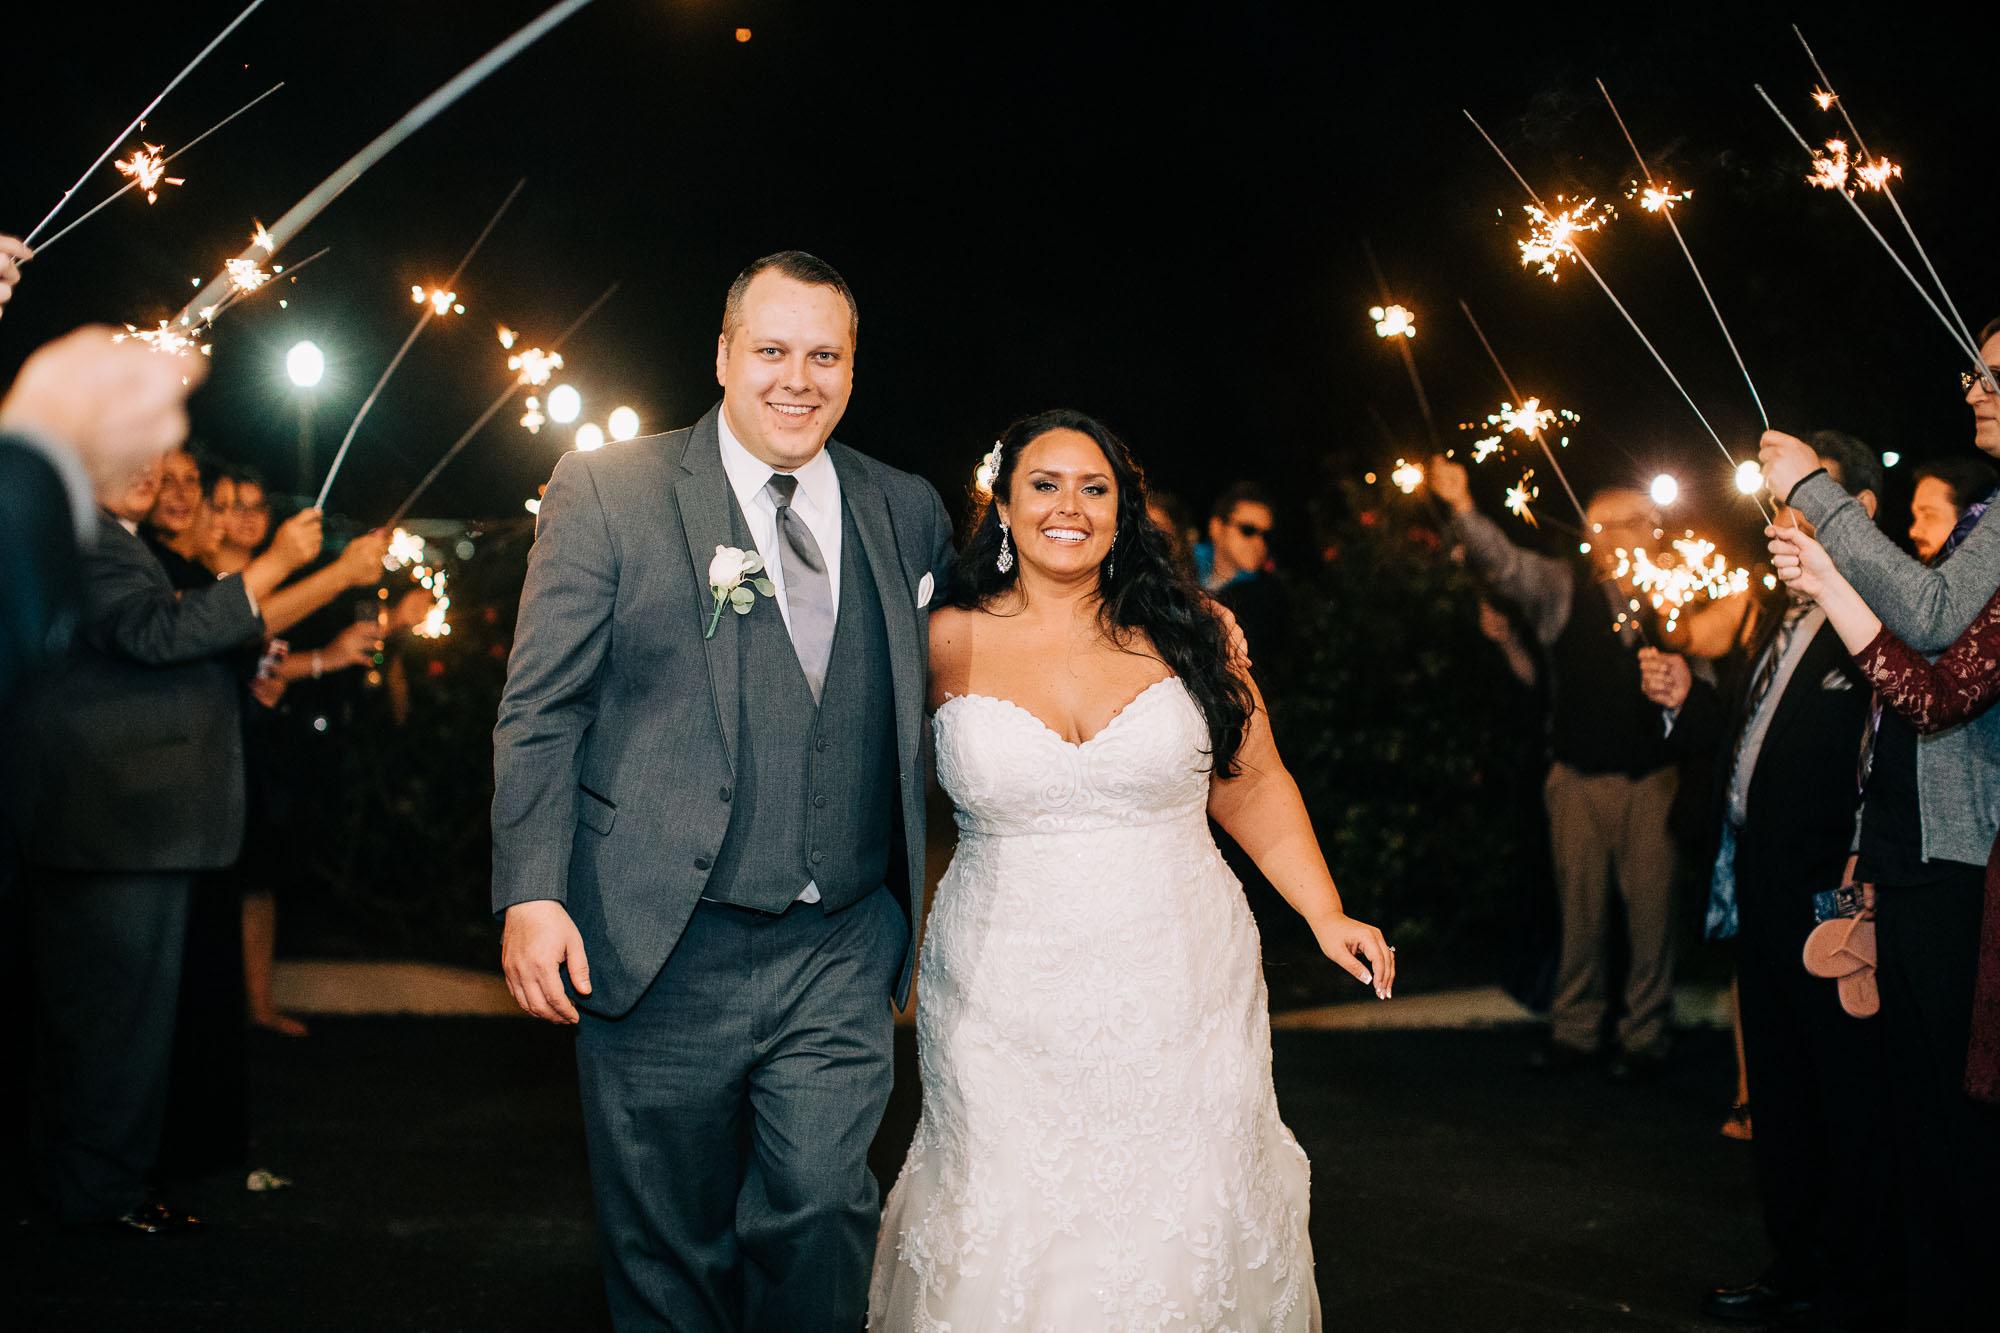 stonhedge-country-club-wedding-3548.jpg